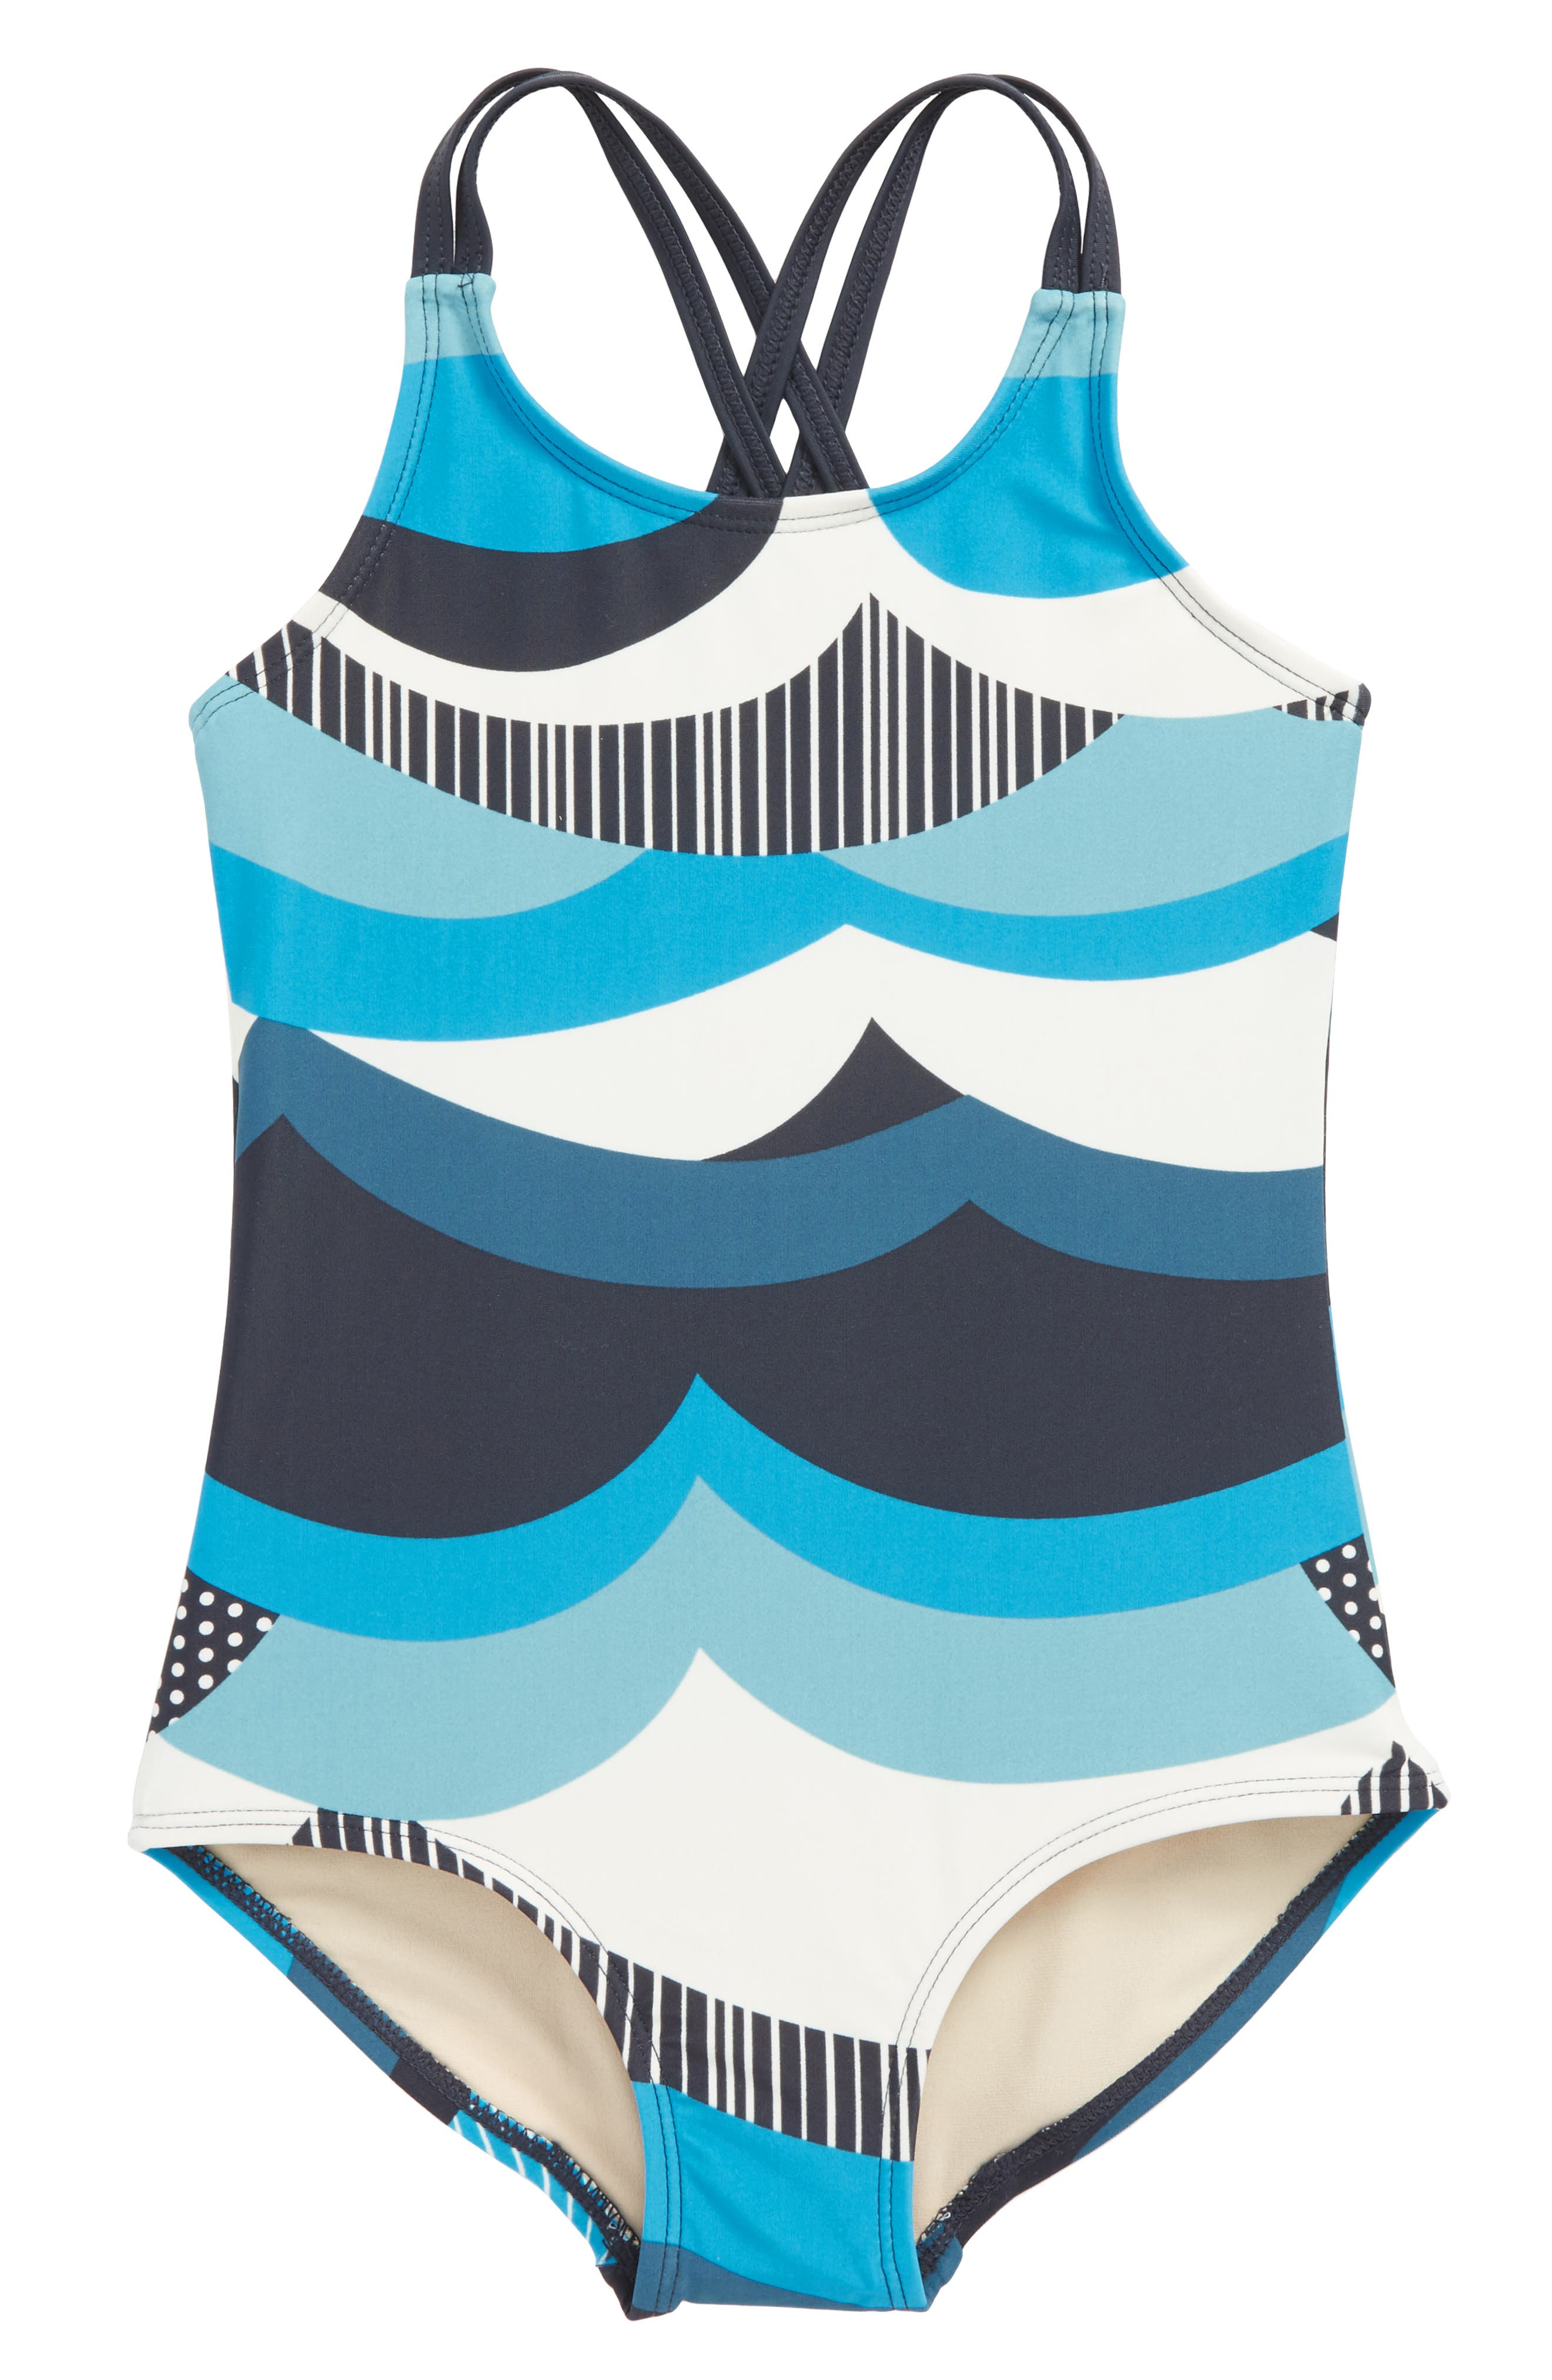 Make Waves One-Piece Swimsuit,                             Main thumbnail 1, color,                             Indigo